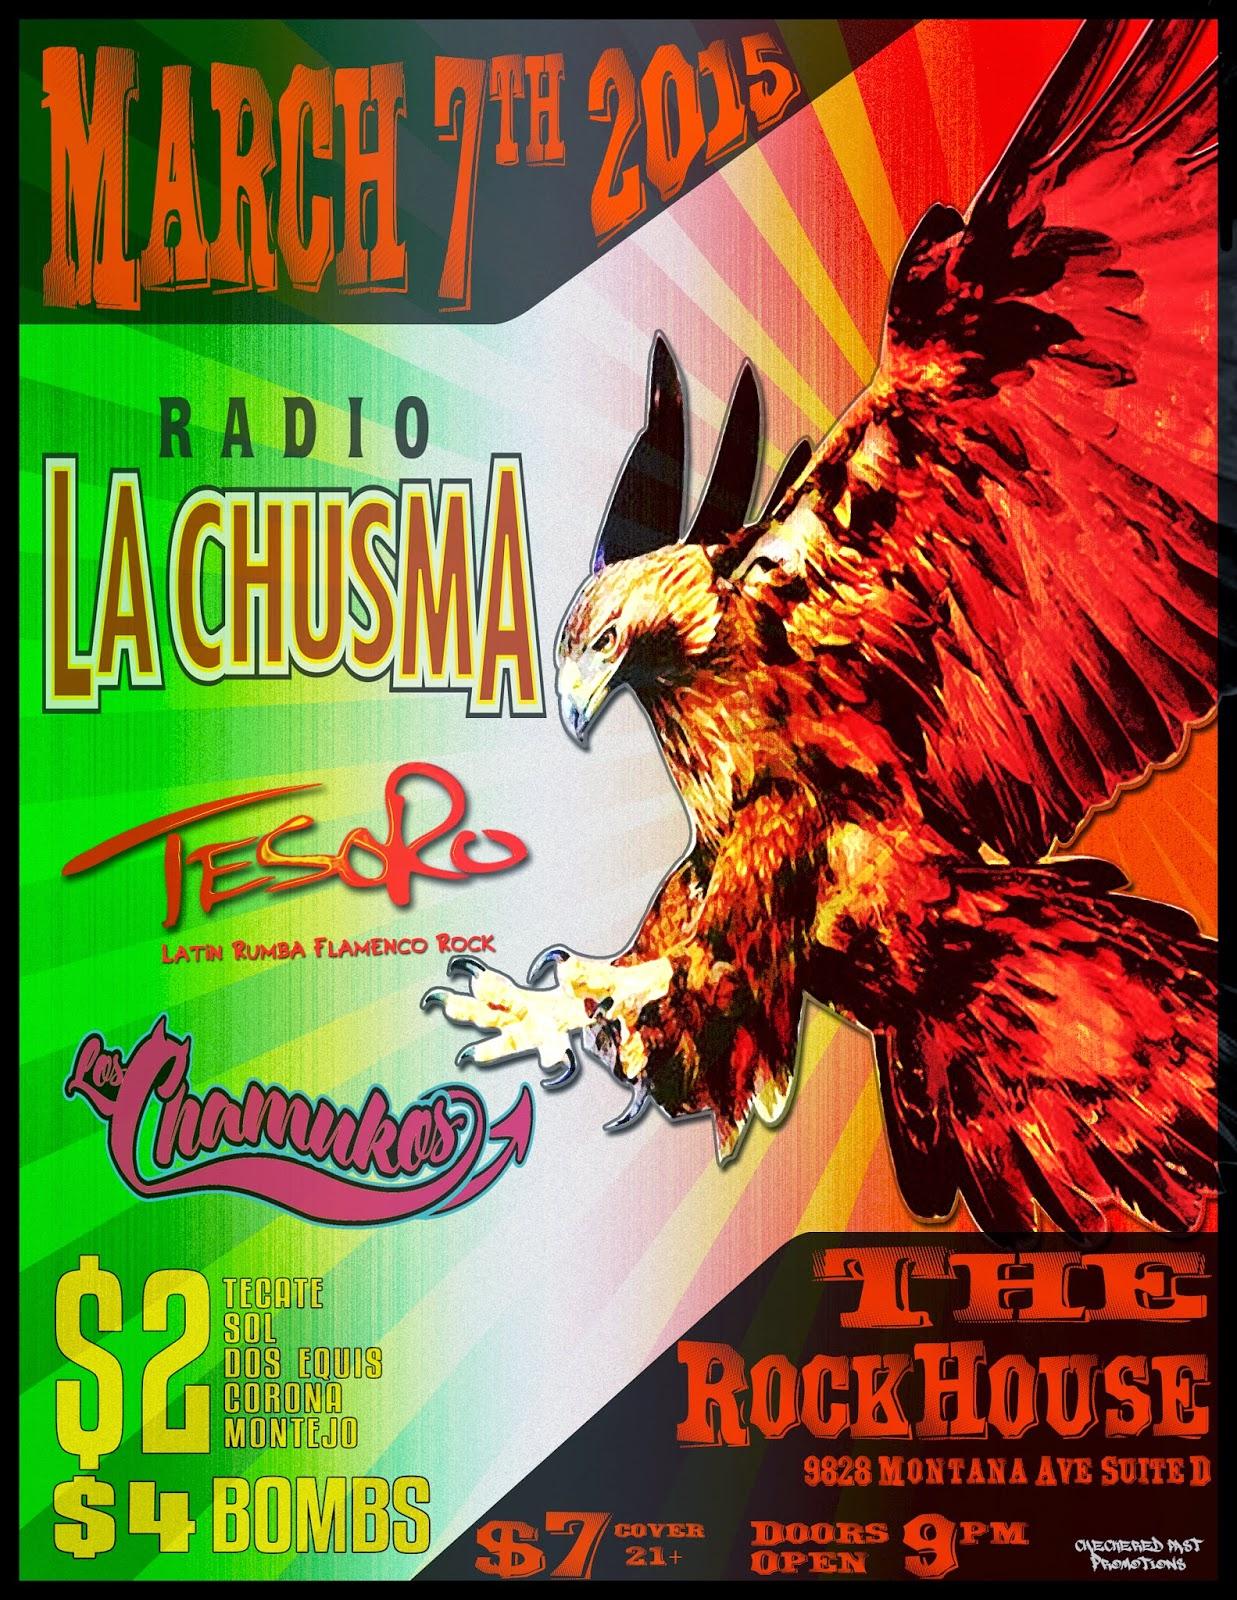 radio la chusma, rumba, reggae, el paso, live music